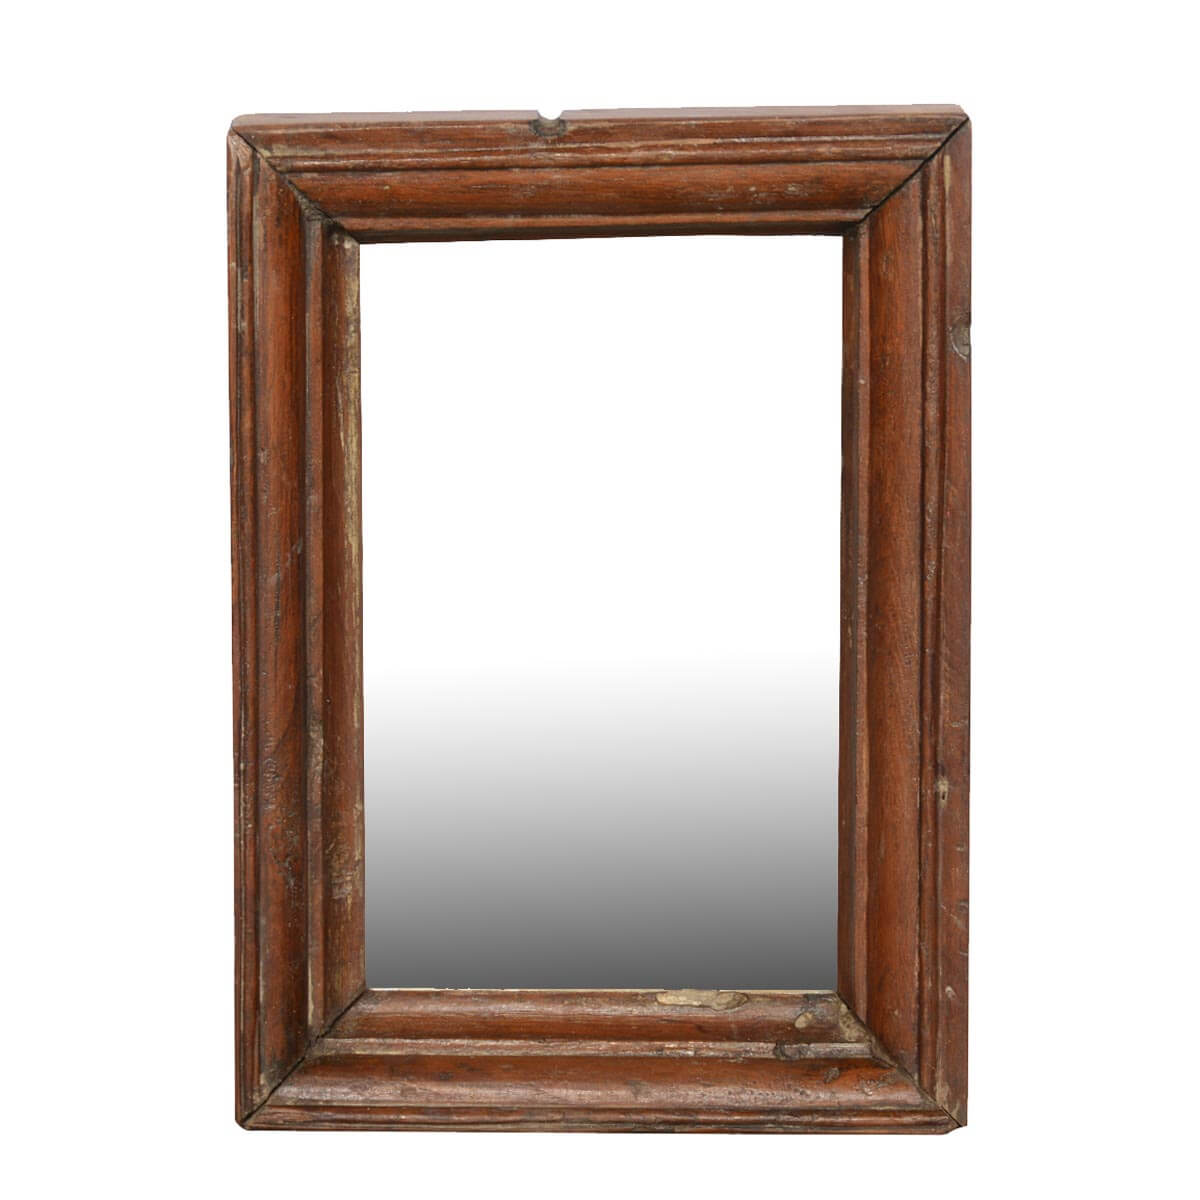 Rustic Farmhouse Reclaimed Wood Handmade Wall Mirror Frame